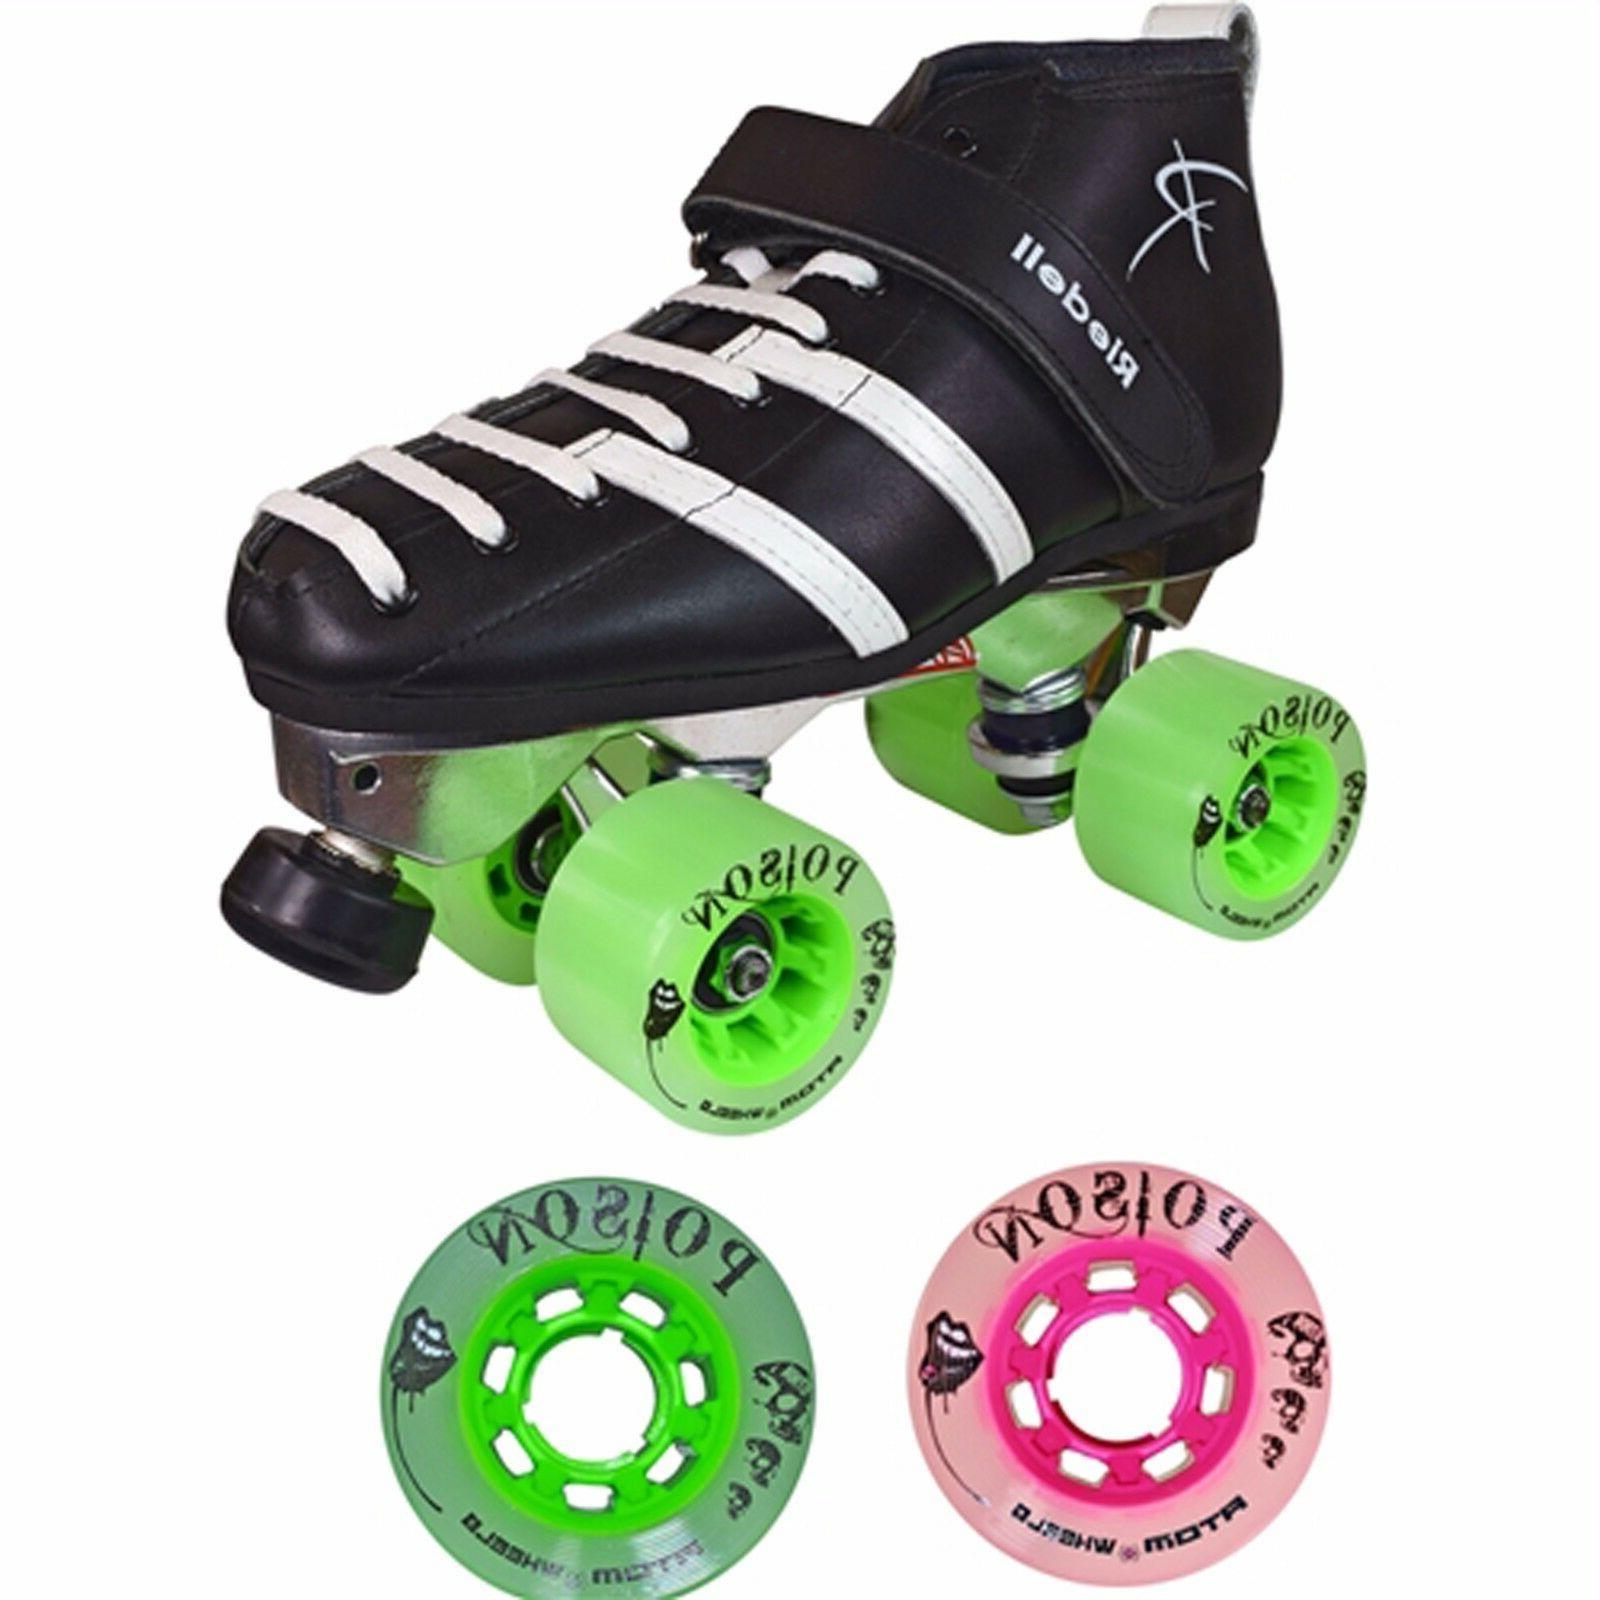 265 avanti poison quad derby skates